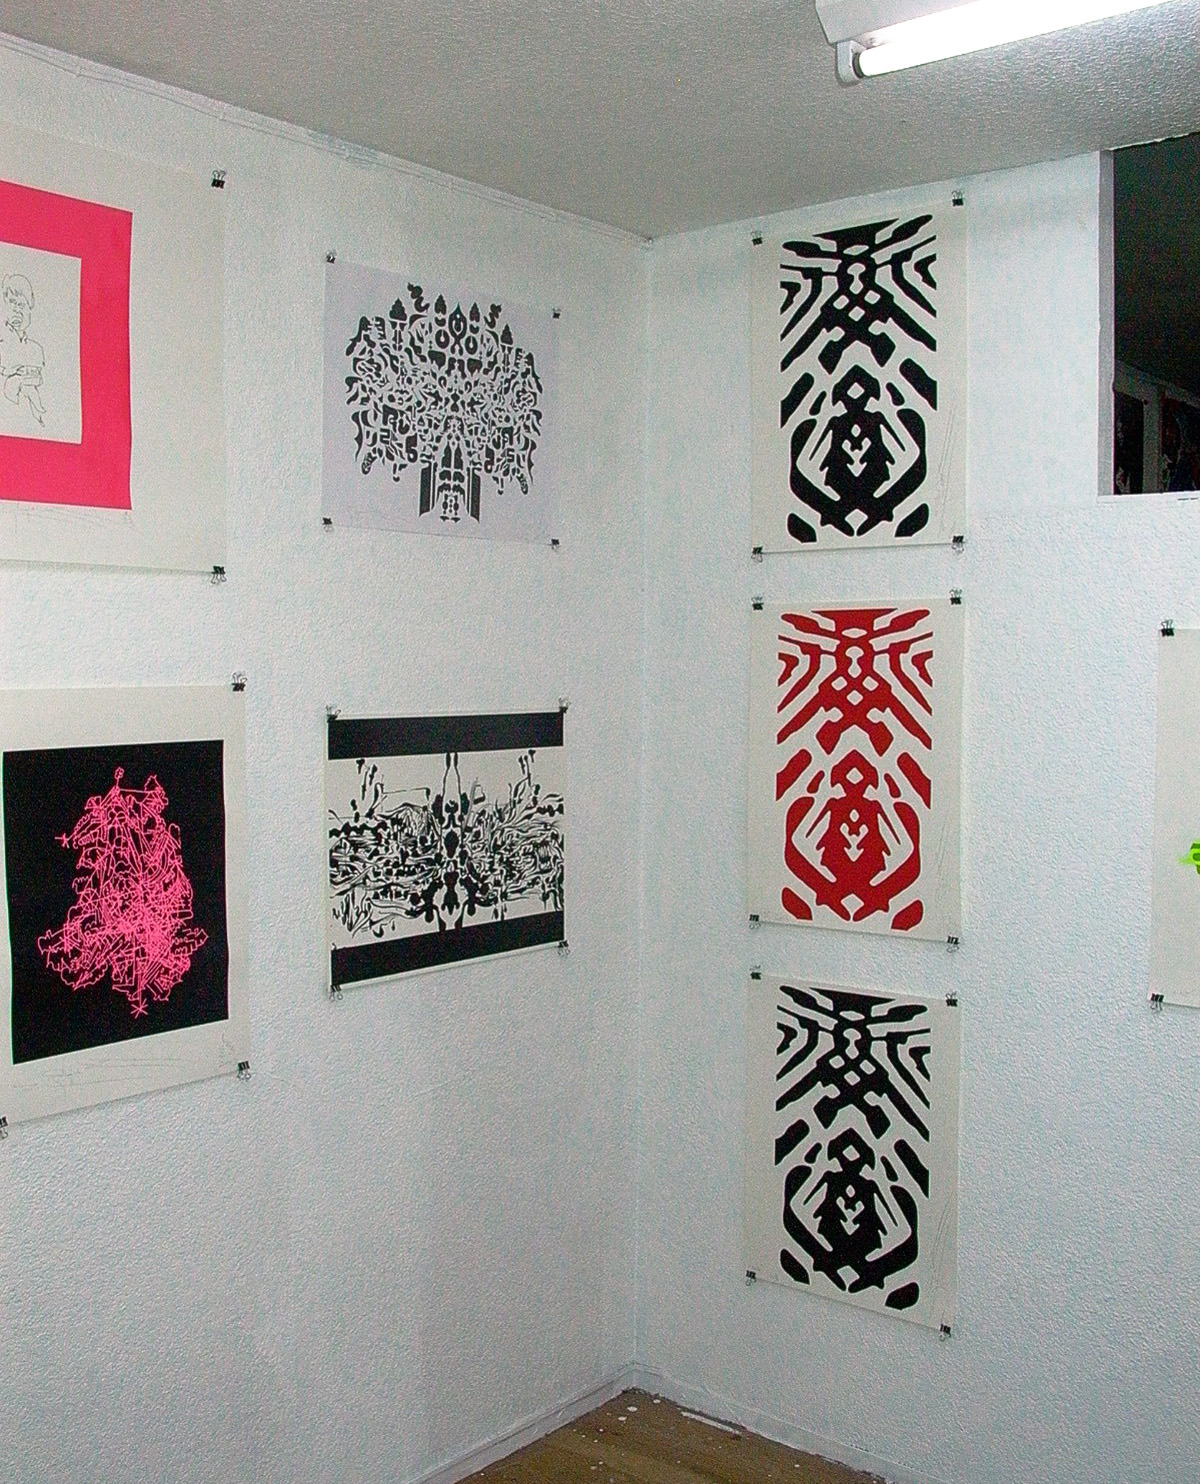 Installation view,  Inconxistence  Dyezue Gallery akameguro, 2003